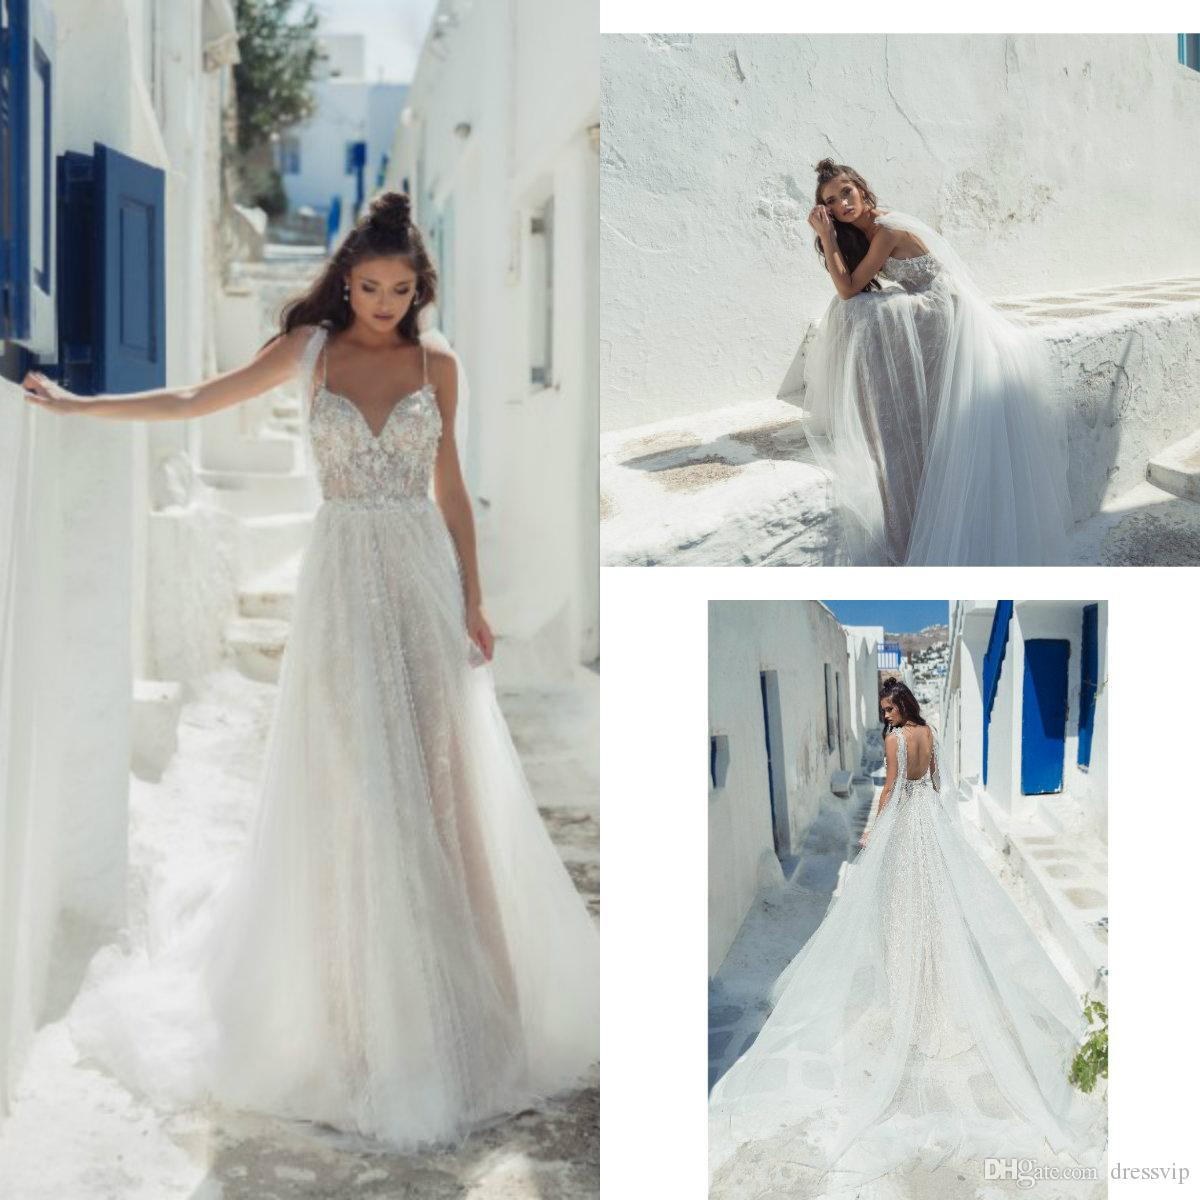 a1701b6bda Discount 2019 Julie Vino Beach Wedding Dresses Spaghetti A Line Sleeveless Boho  Bohemian Lace Wedding Dress Custom Made Plus Size Bridal Gowns Wedding Dress  ...